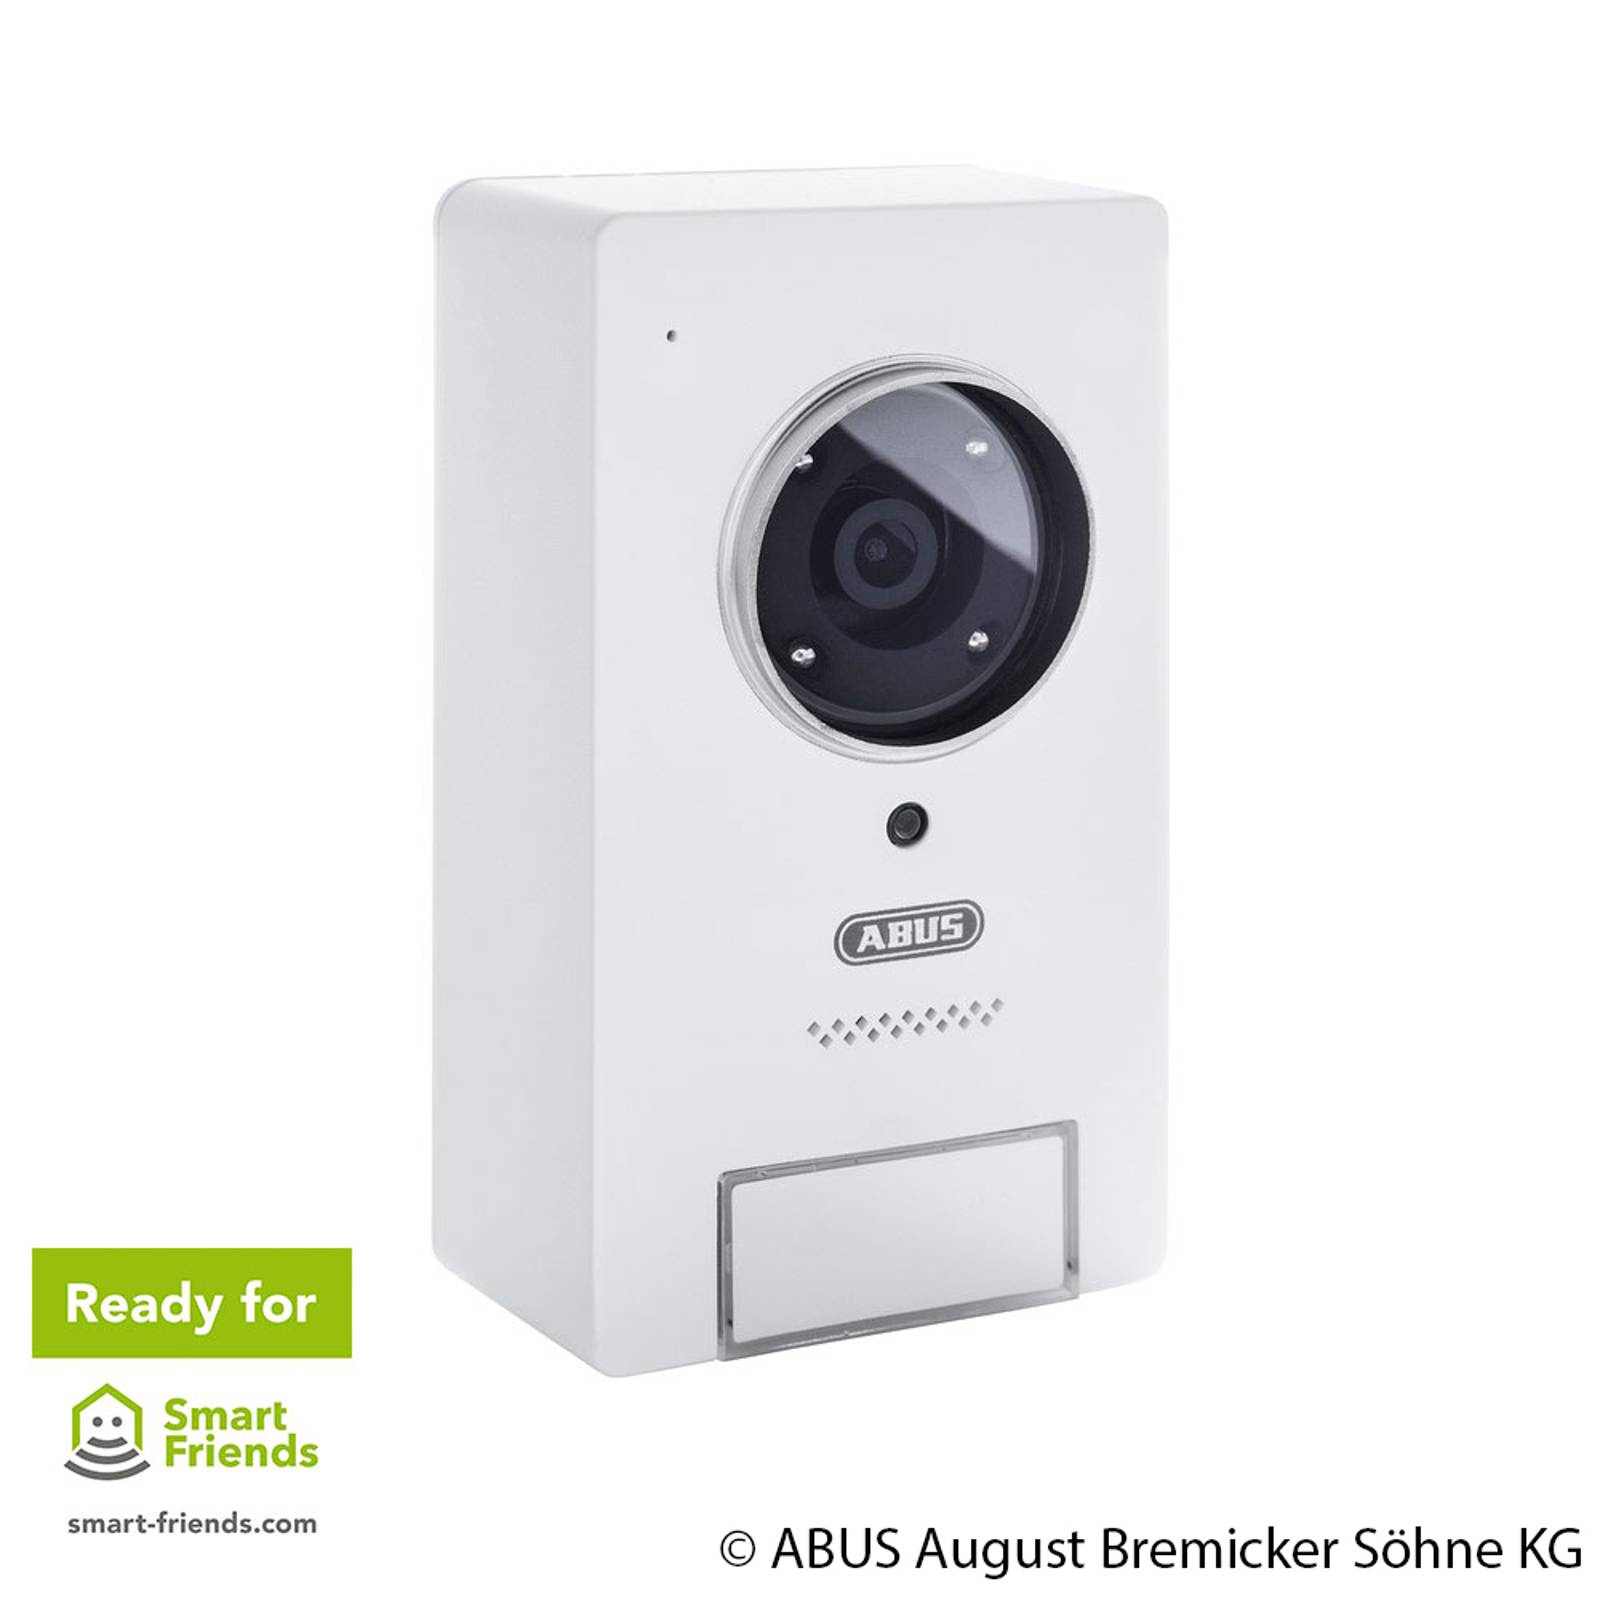 ABUS Smart Security WLAN videocitofono